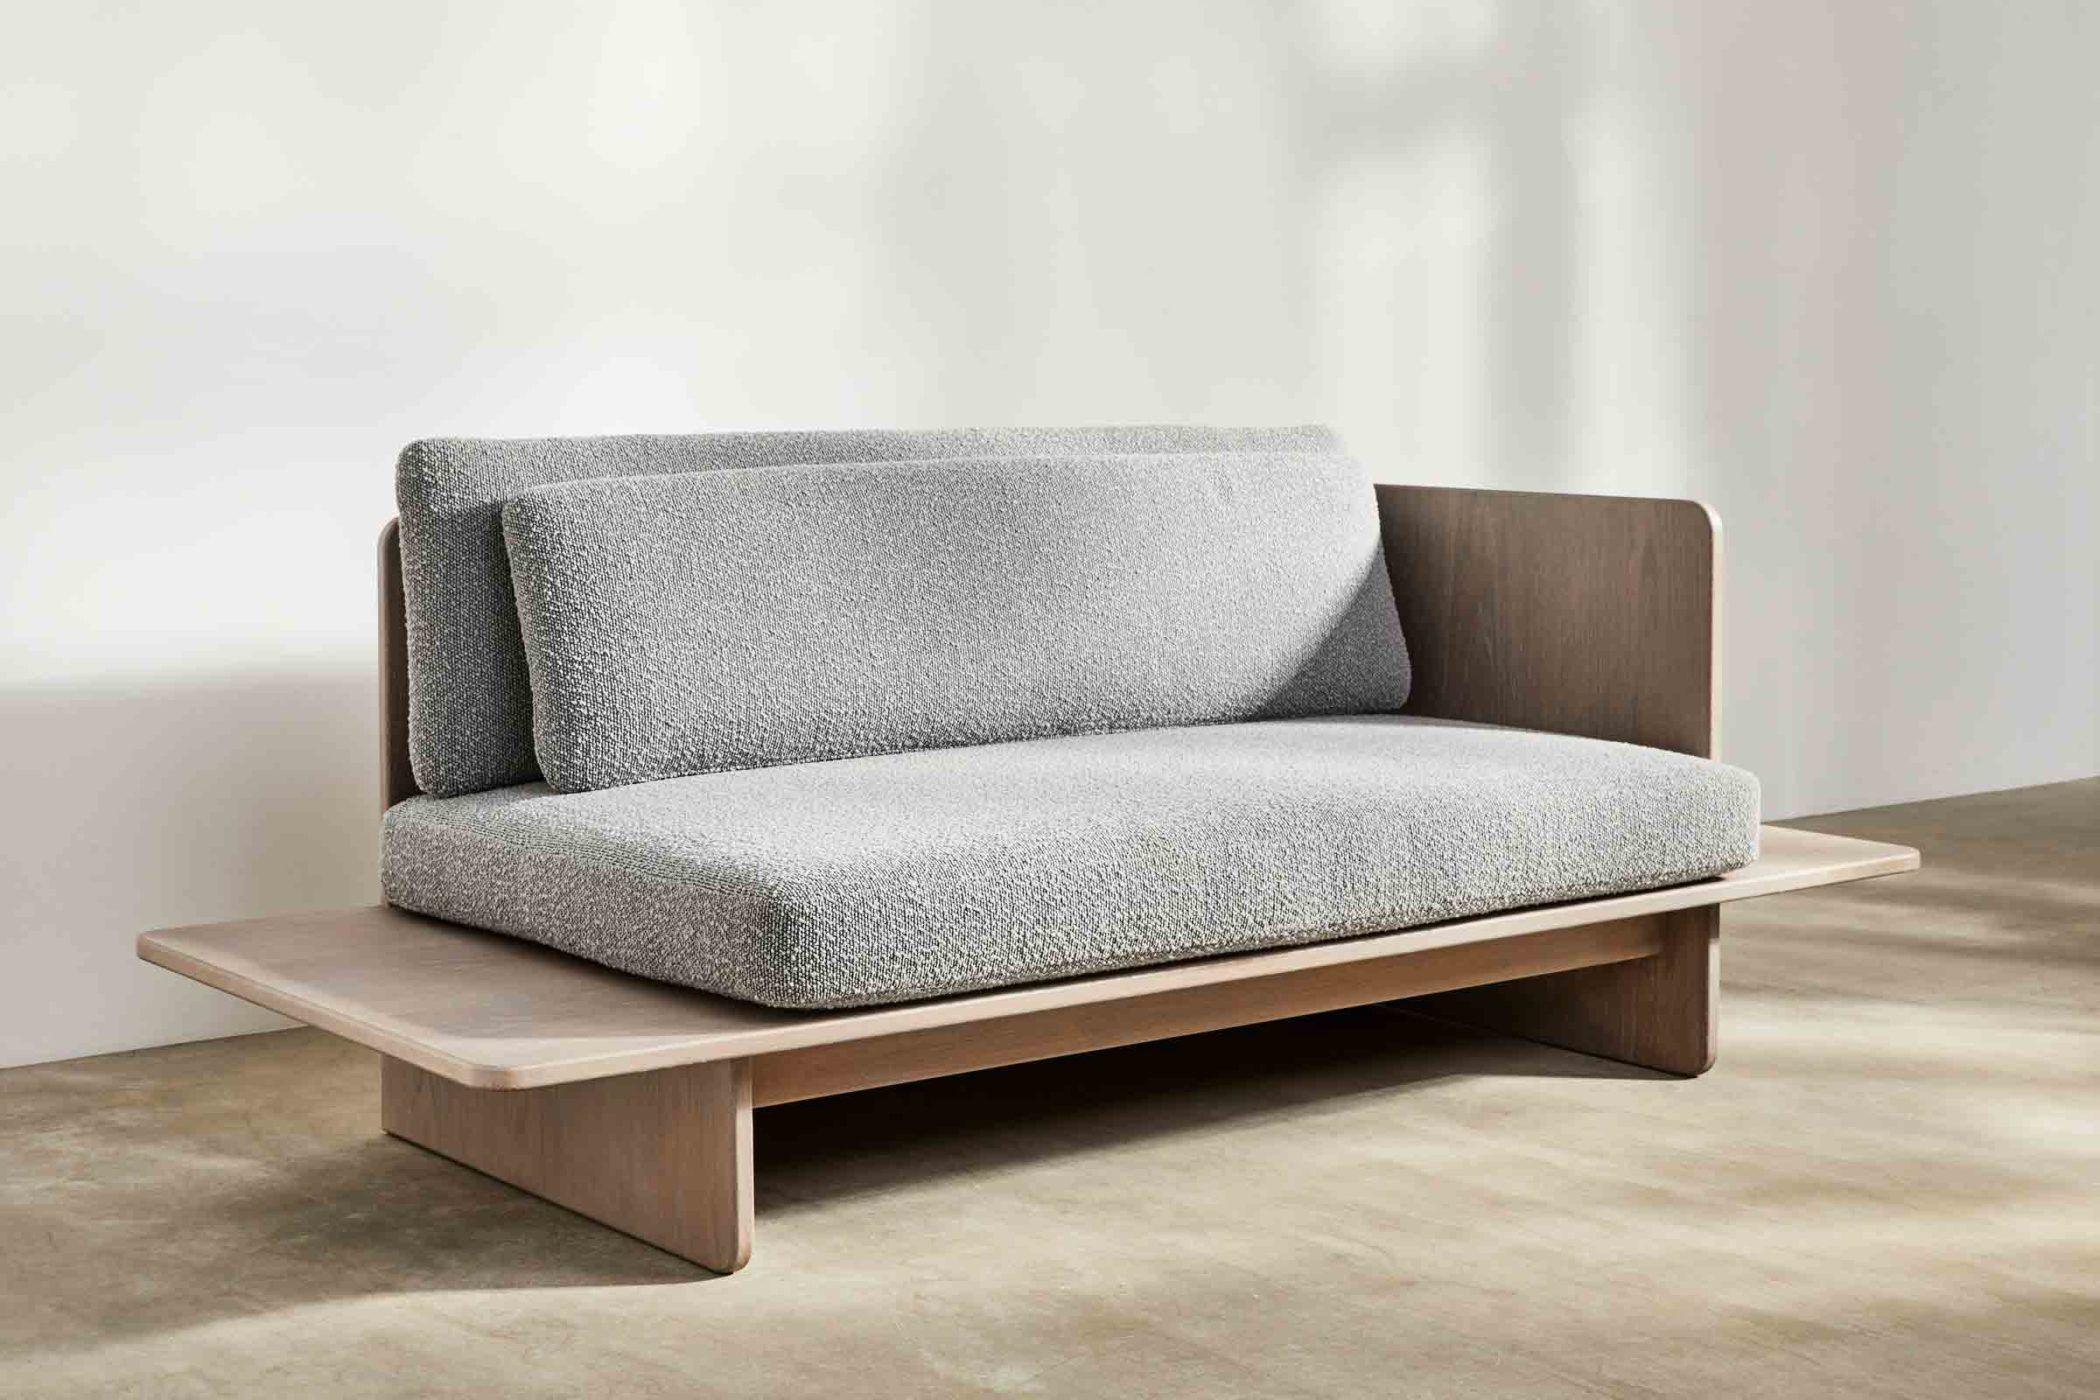 Benchmark Handmade English Furniture Muse Sofa Furniture Sofa English Furniture